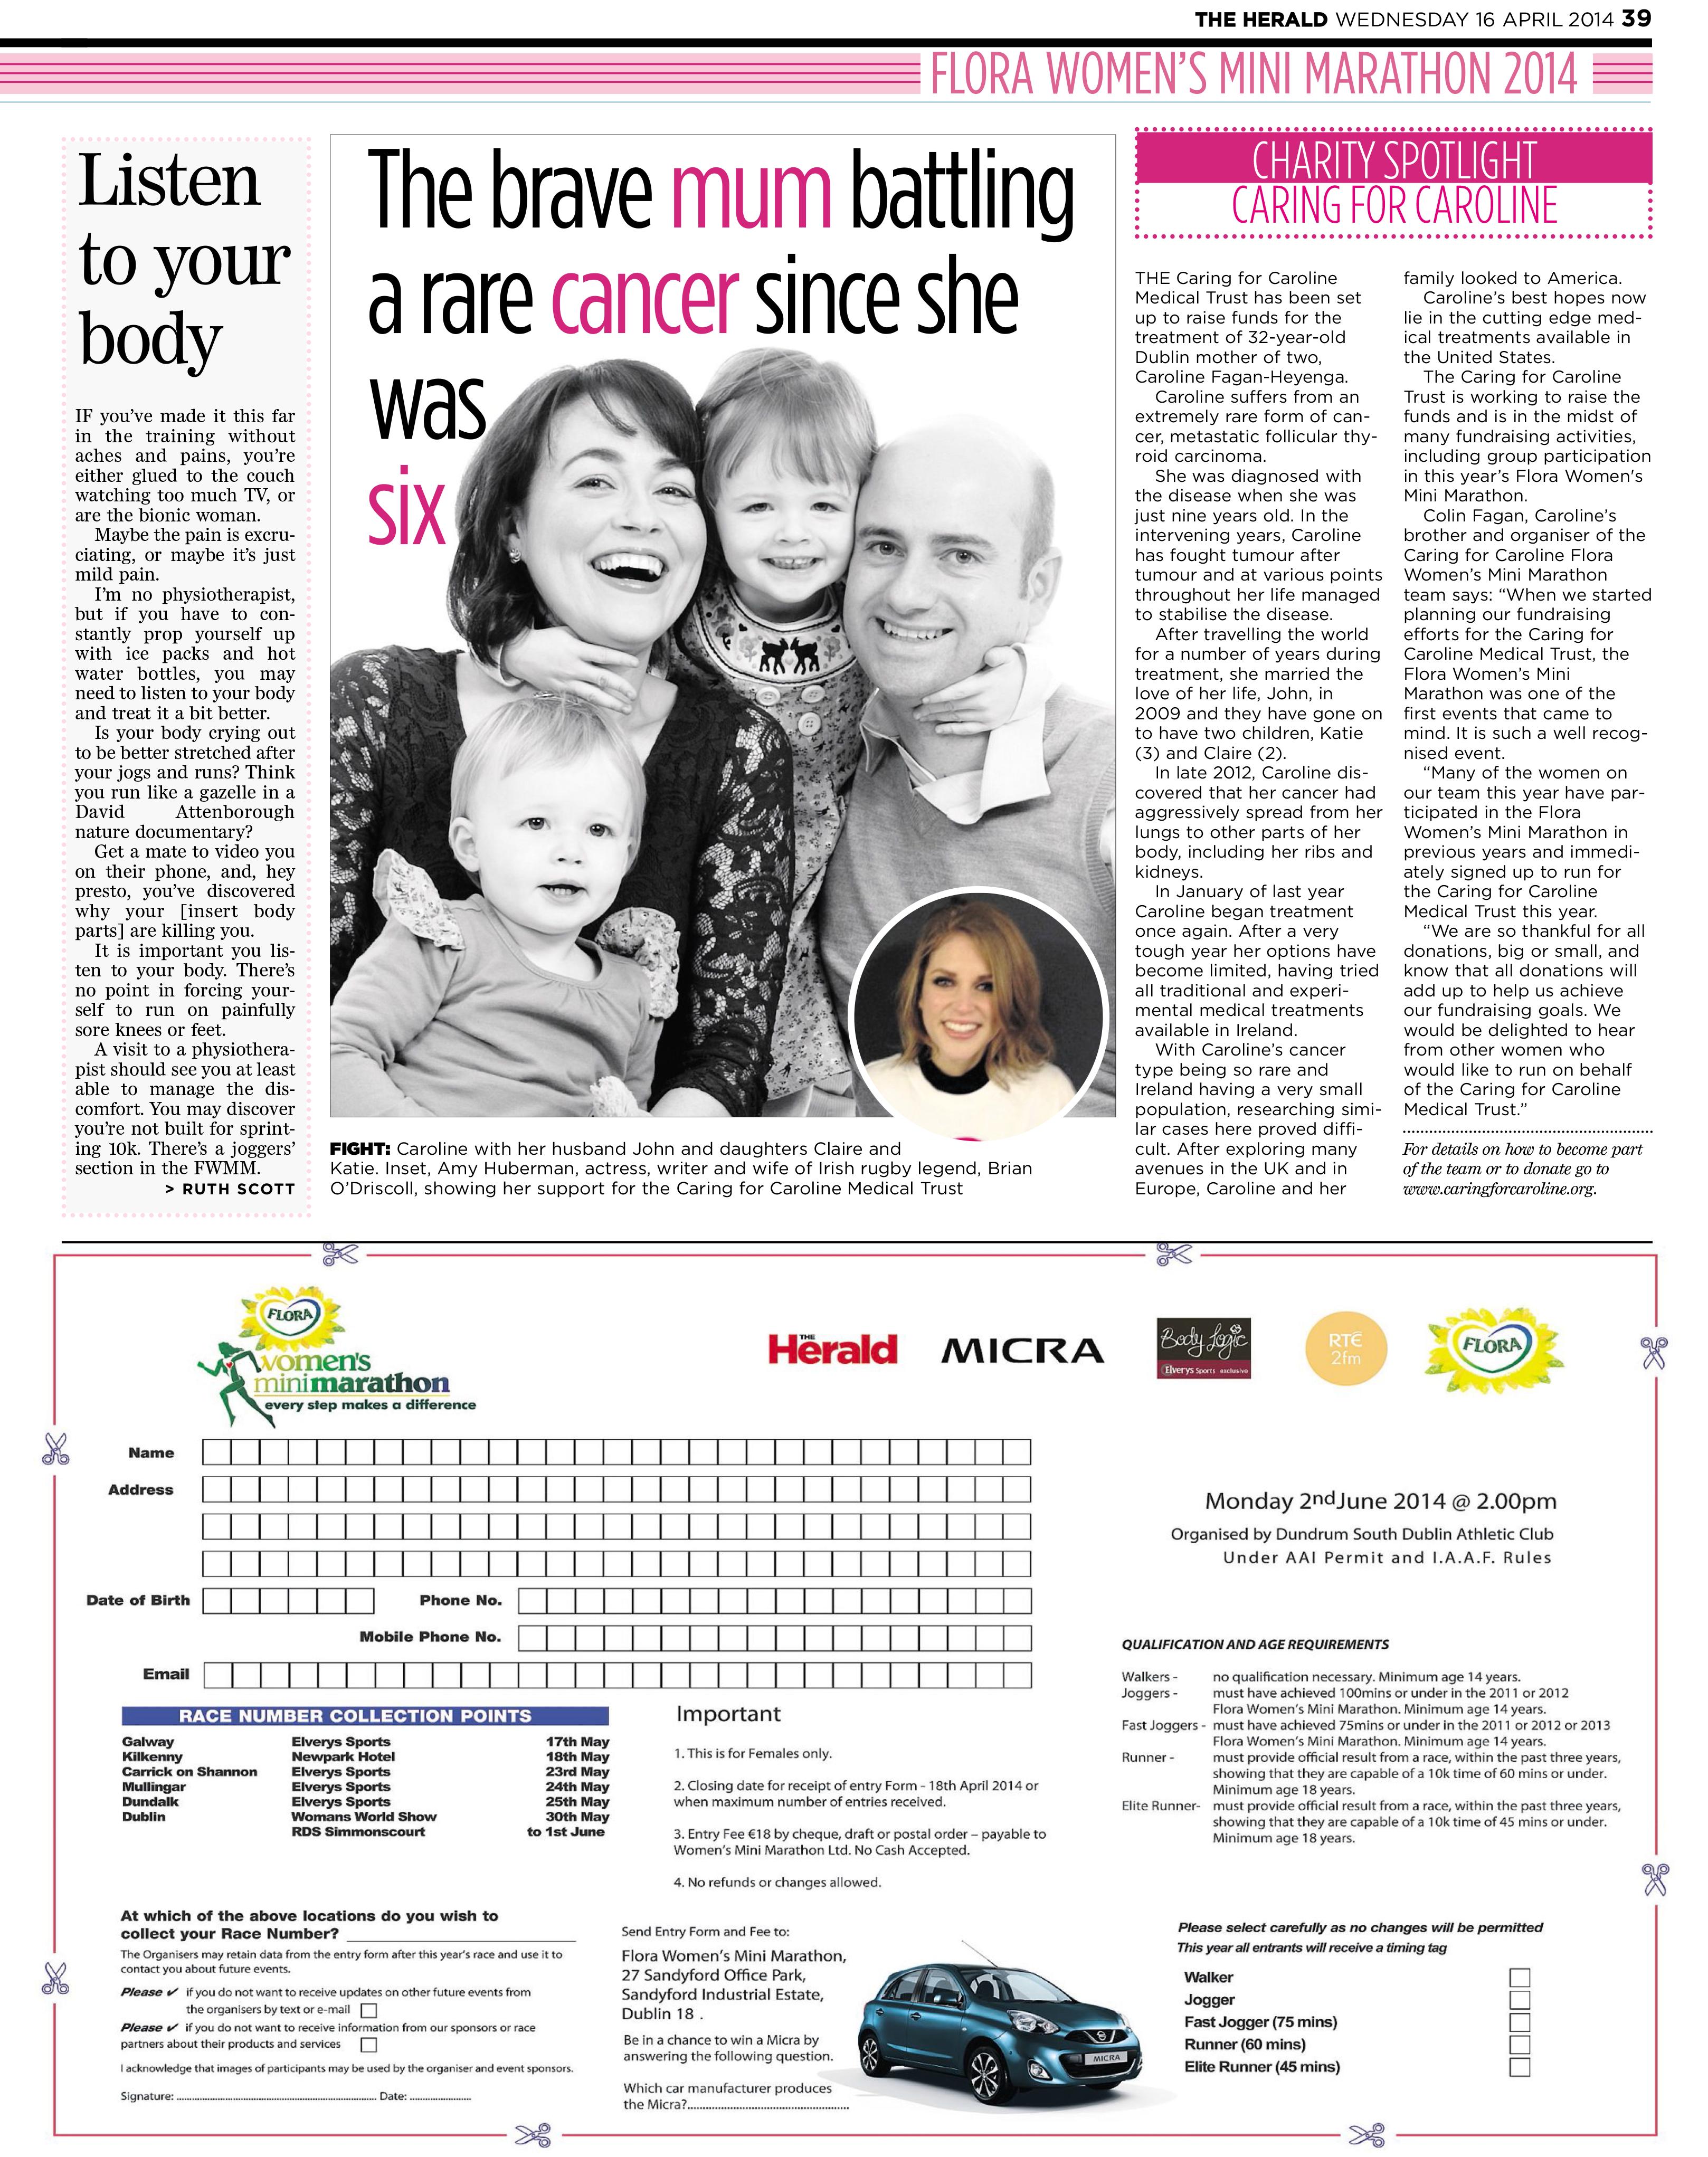 Evening Herald April 17th 2014